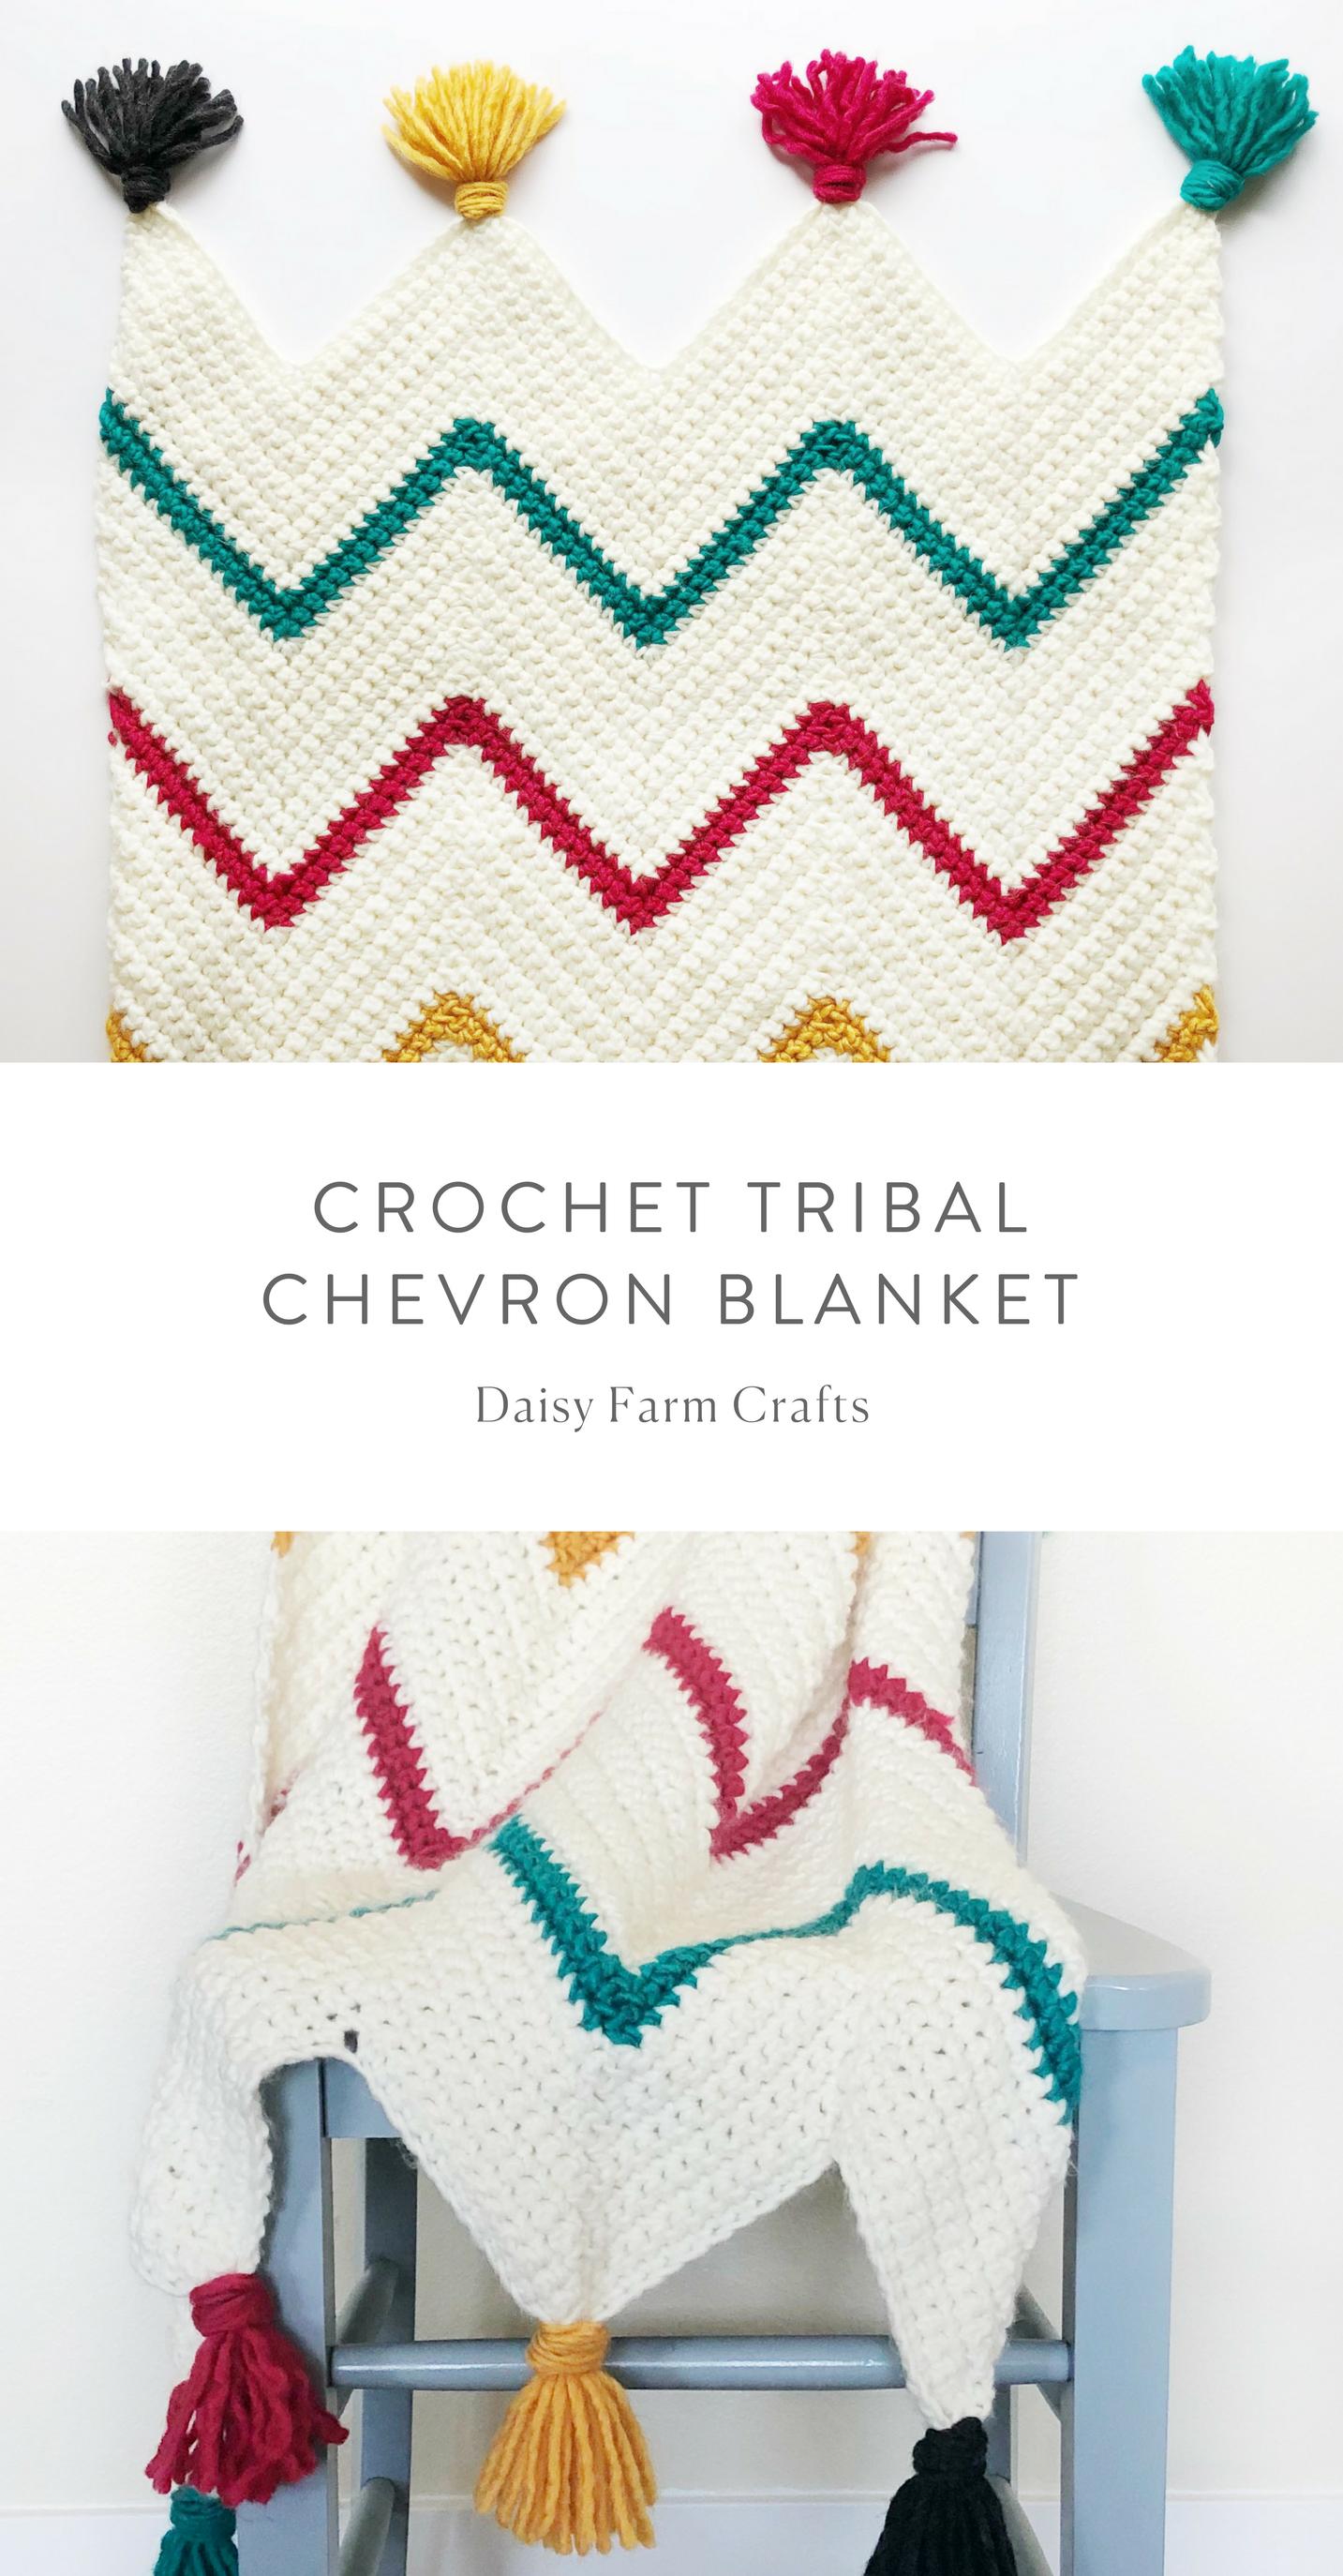 Free Pattern - Crochet Tribal Chevron Blanket | Crochet Blanket ...